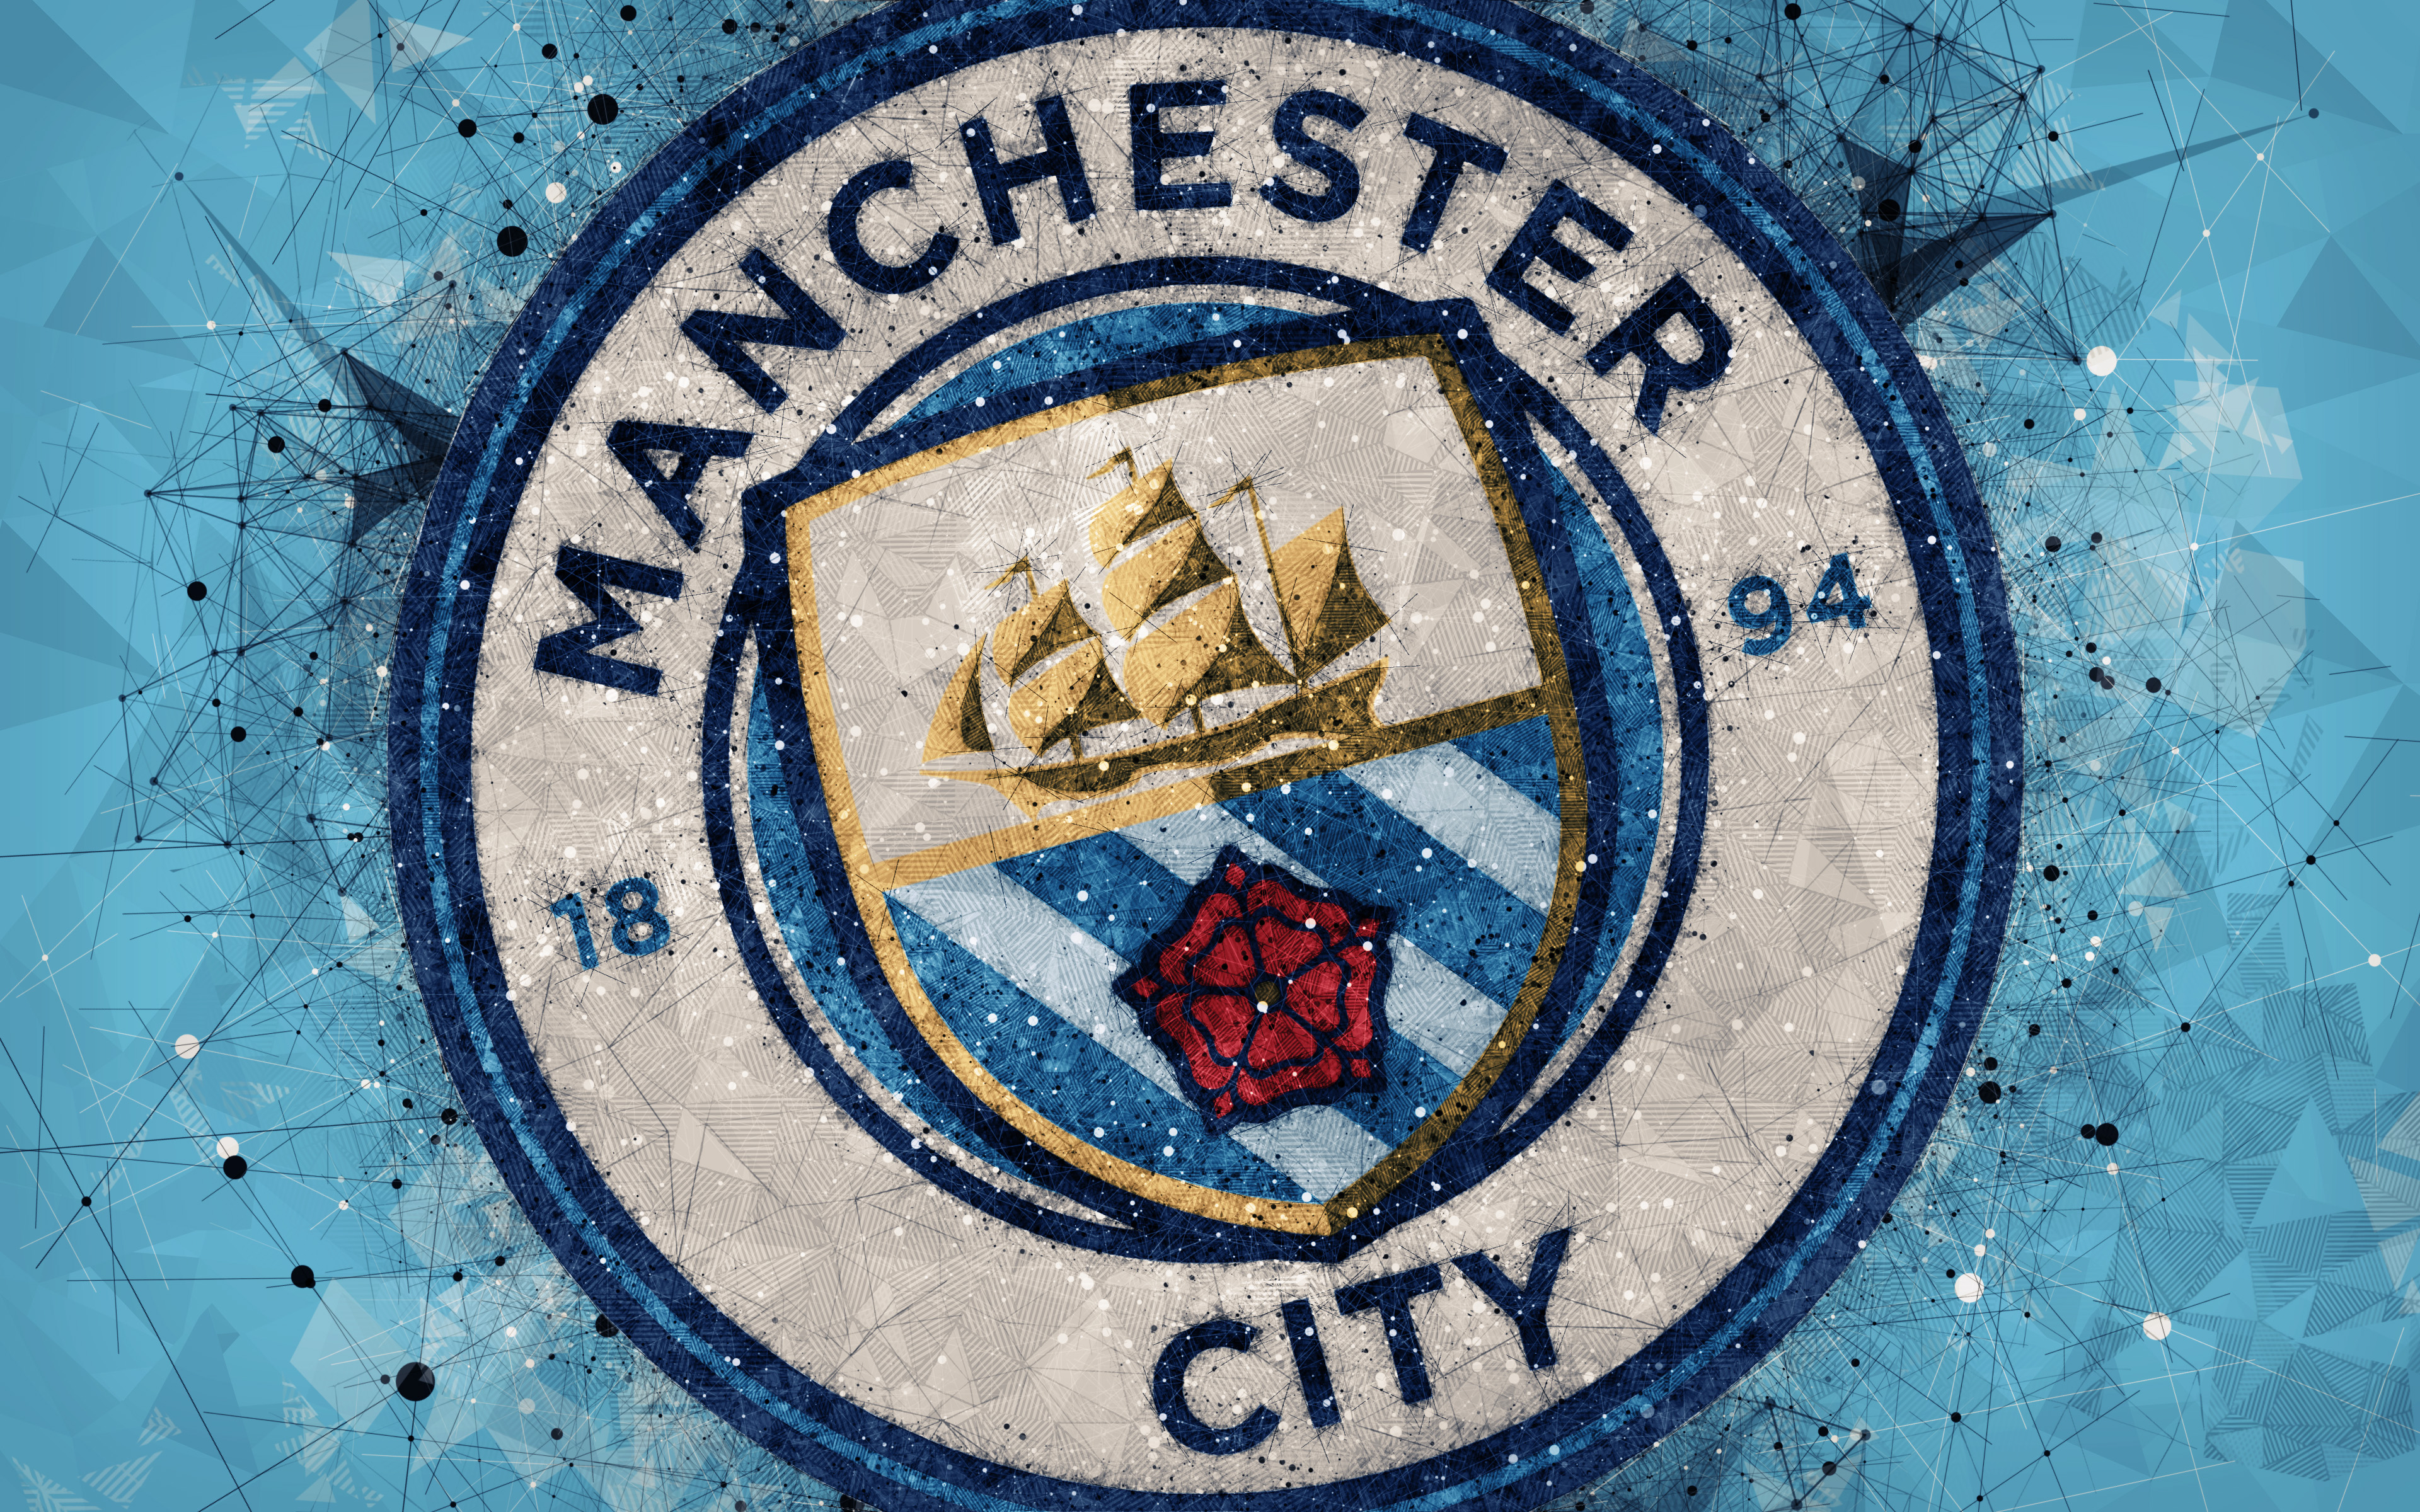 Free download Manchester City Logo 4k Ultra HD Wallpaper ...